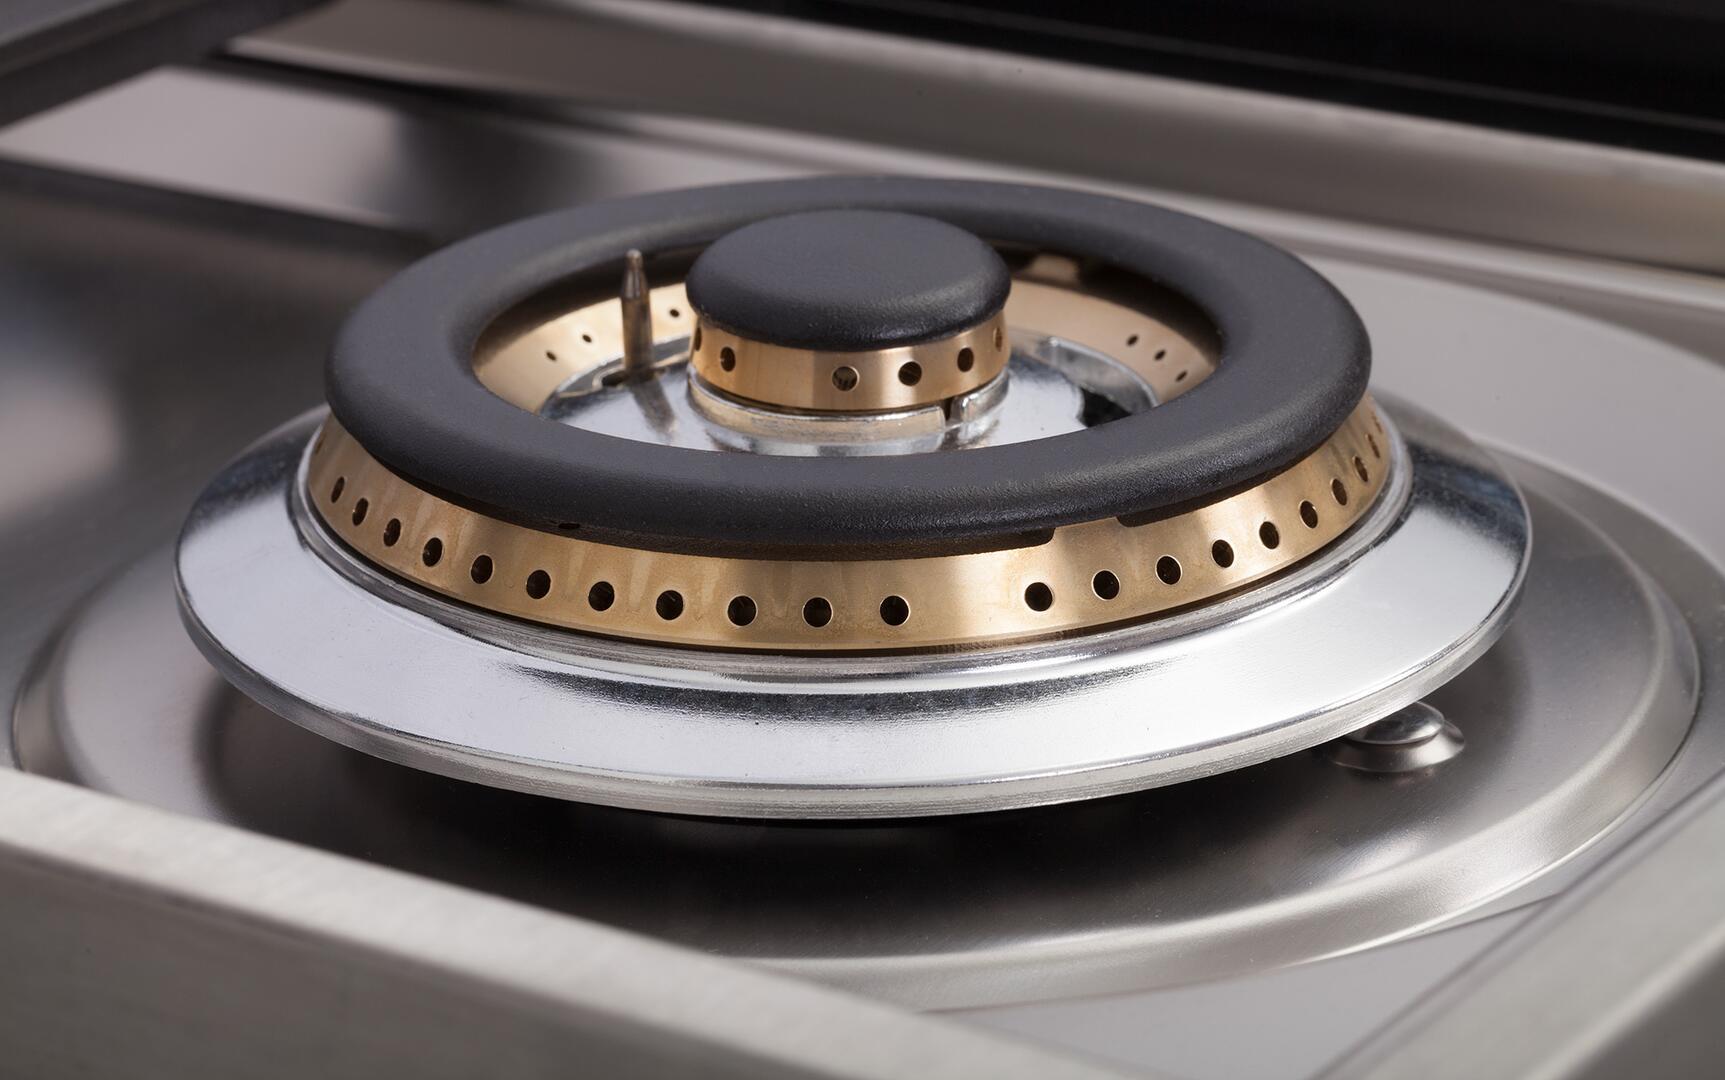 Ilve Professional Plus UPW90FDVGGB Freestanding Gas Range White, 25